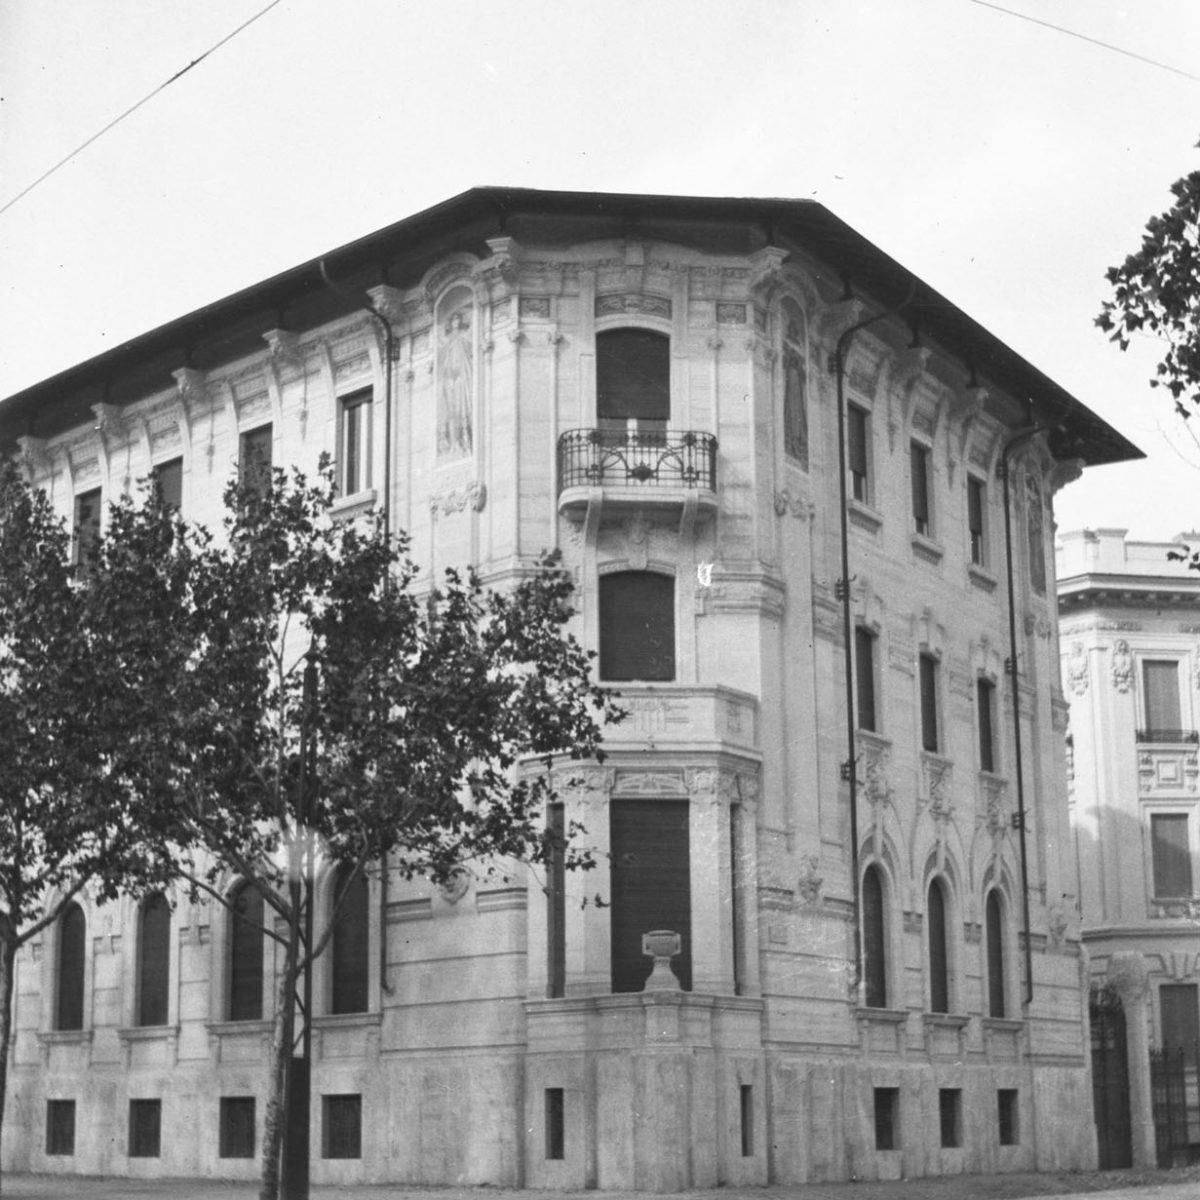 17 - Villa Astengo, Lungotevere de' Cenci